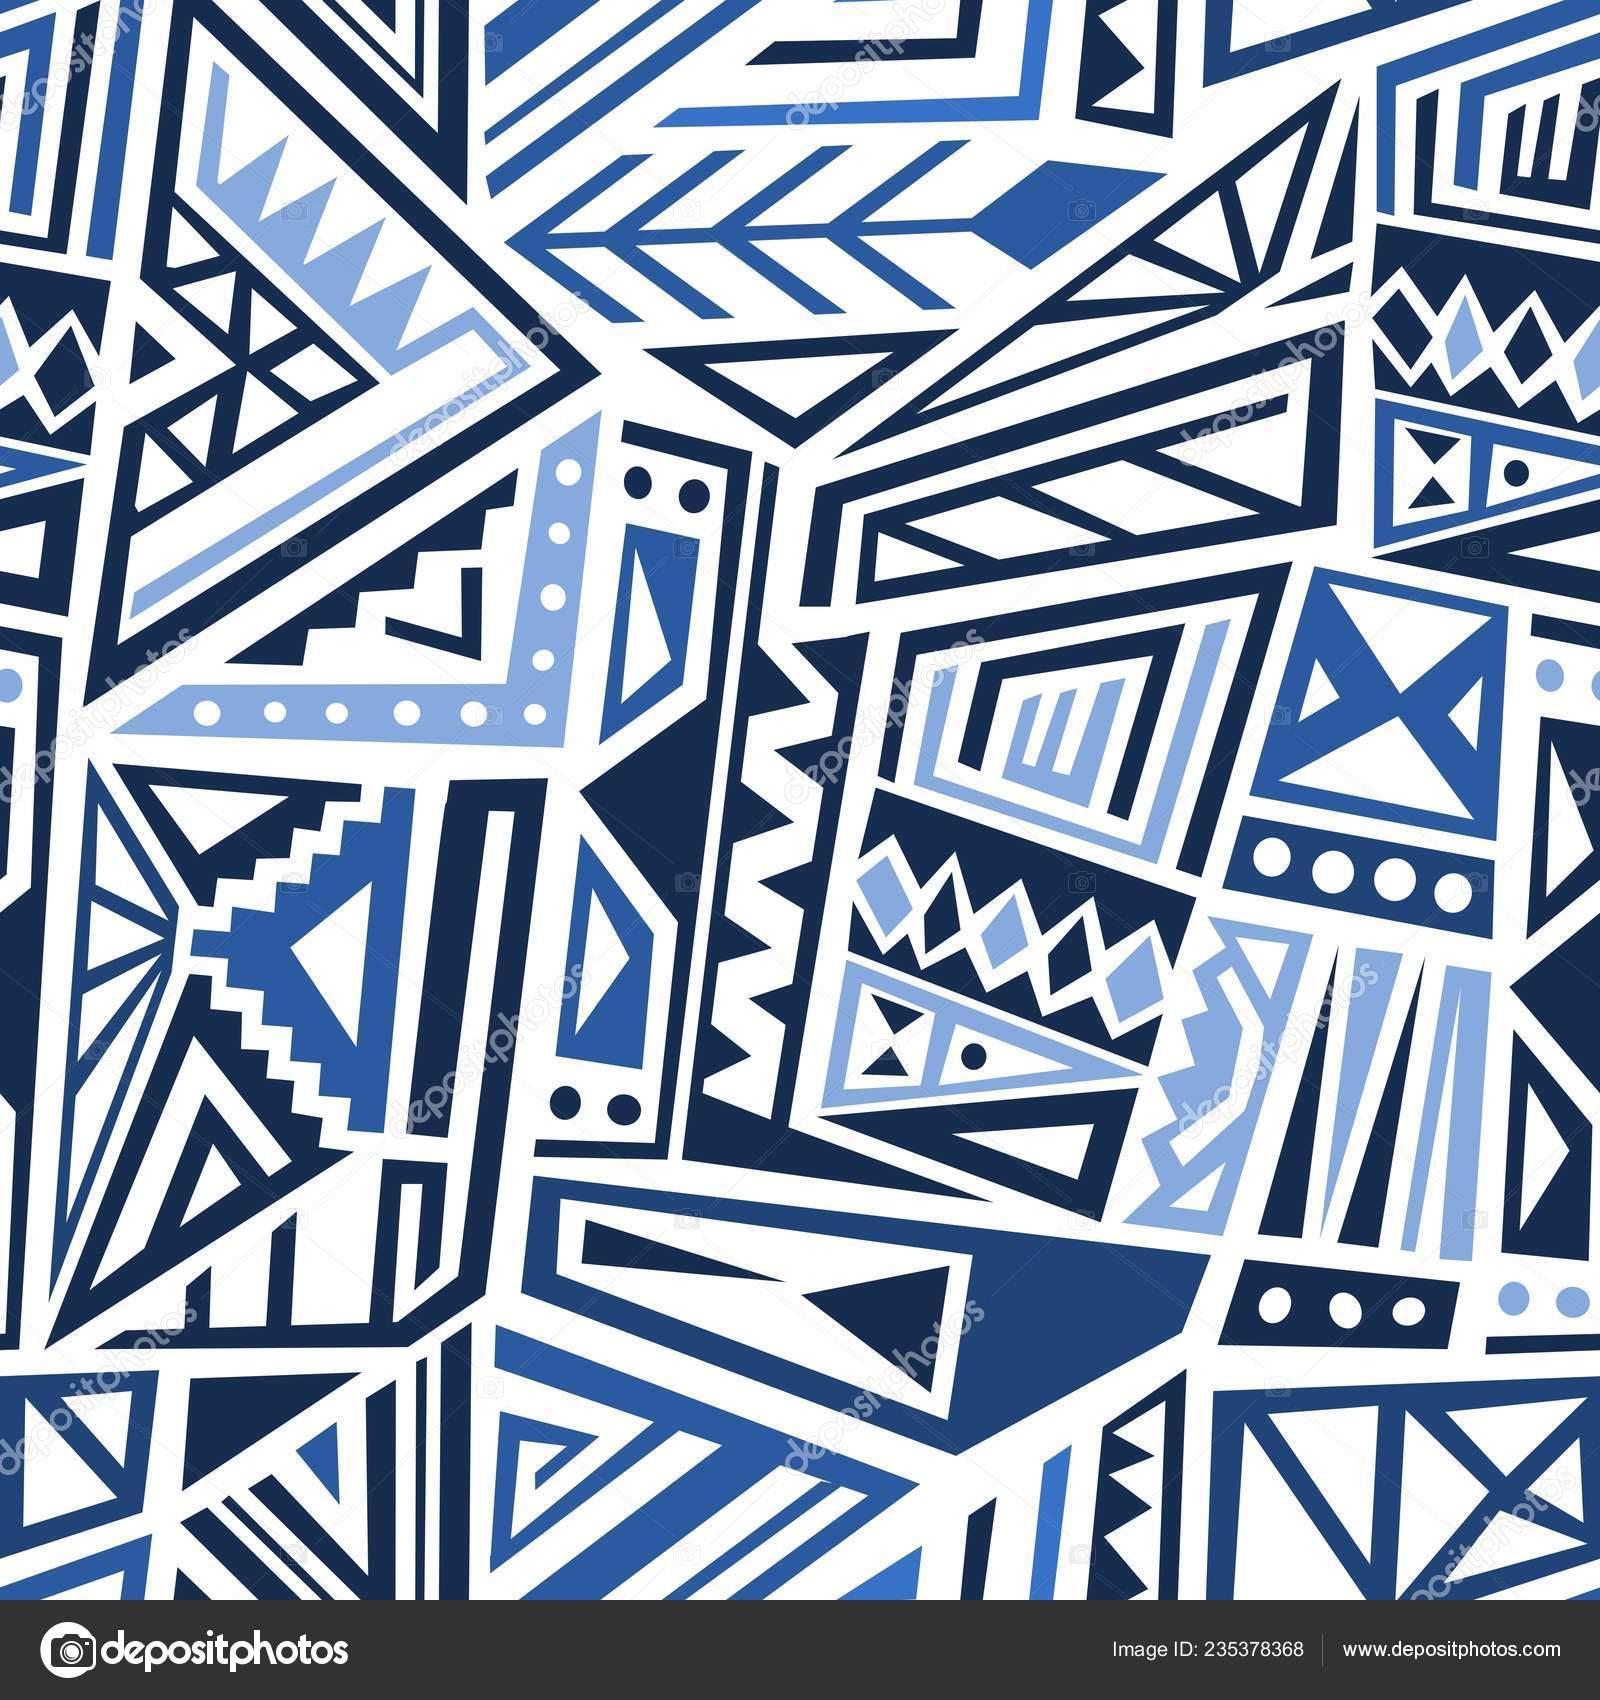 Vector Patrón Boho Diseño Tela Moda Estilo étnico Azulejo